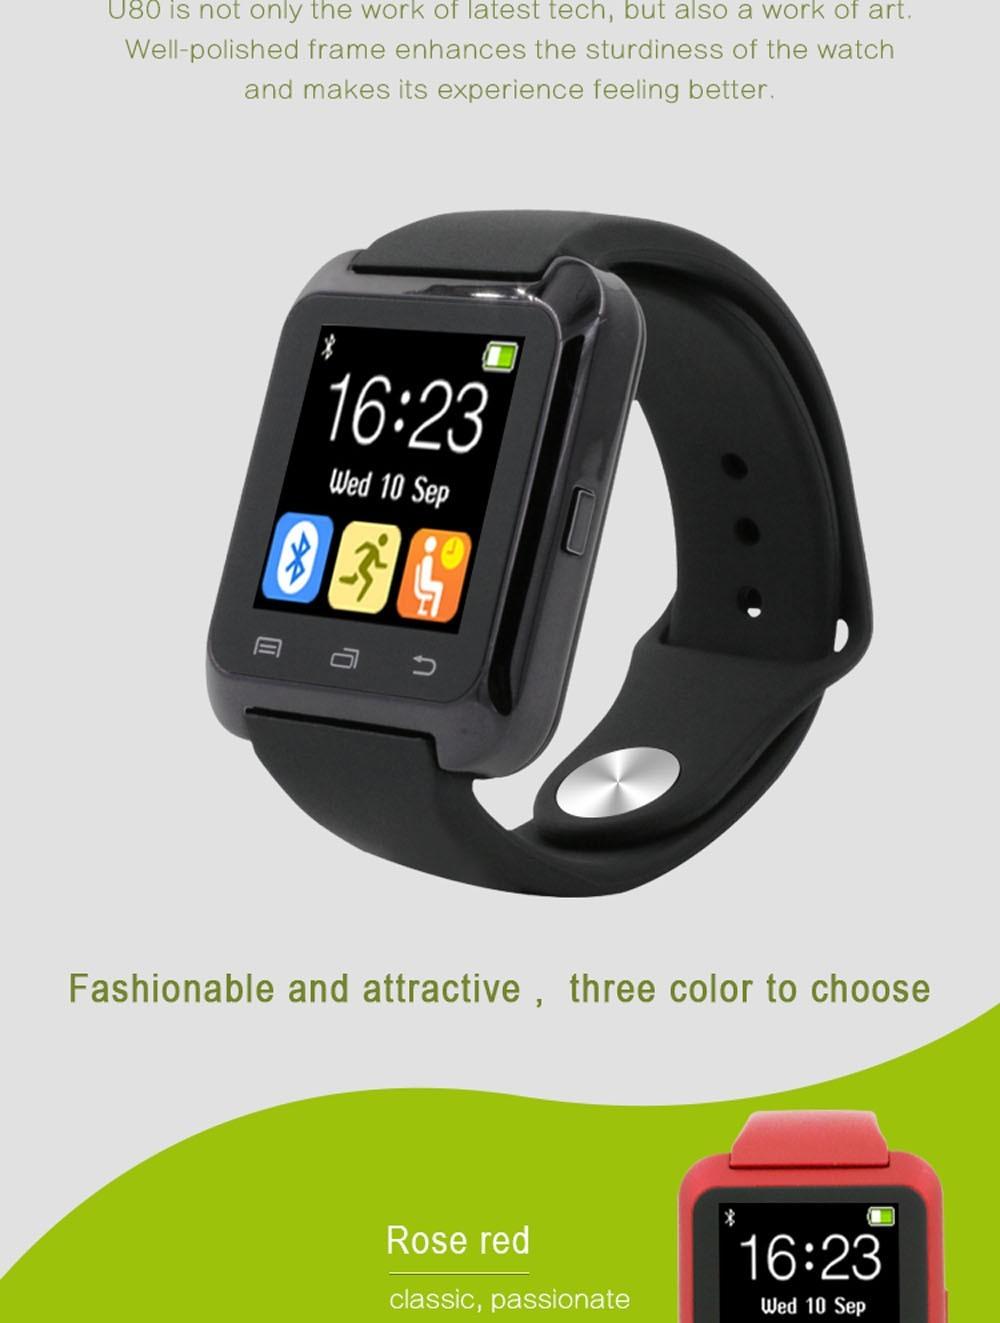 Bluetooth U8 Smartwatch U80 bluetooth 4.0 Wireless Smart Watch Wrist bracelet For Andriod iPhones Pedometer PK xiaomi mi band